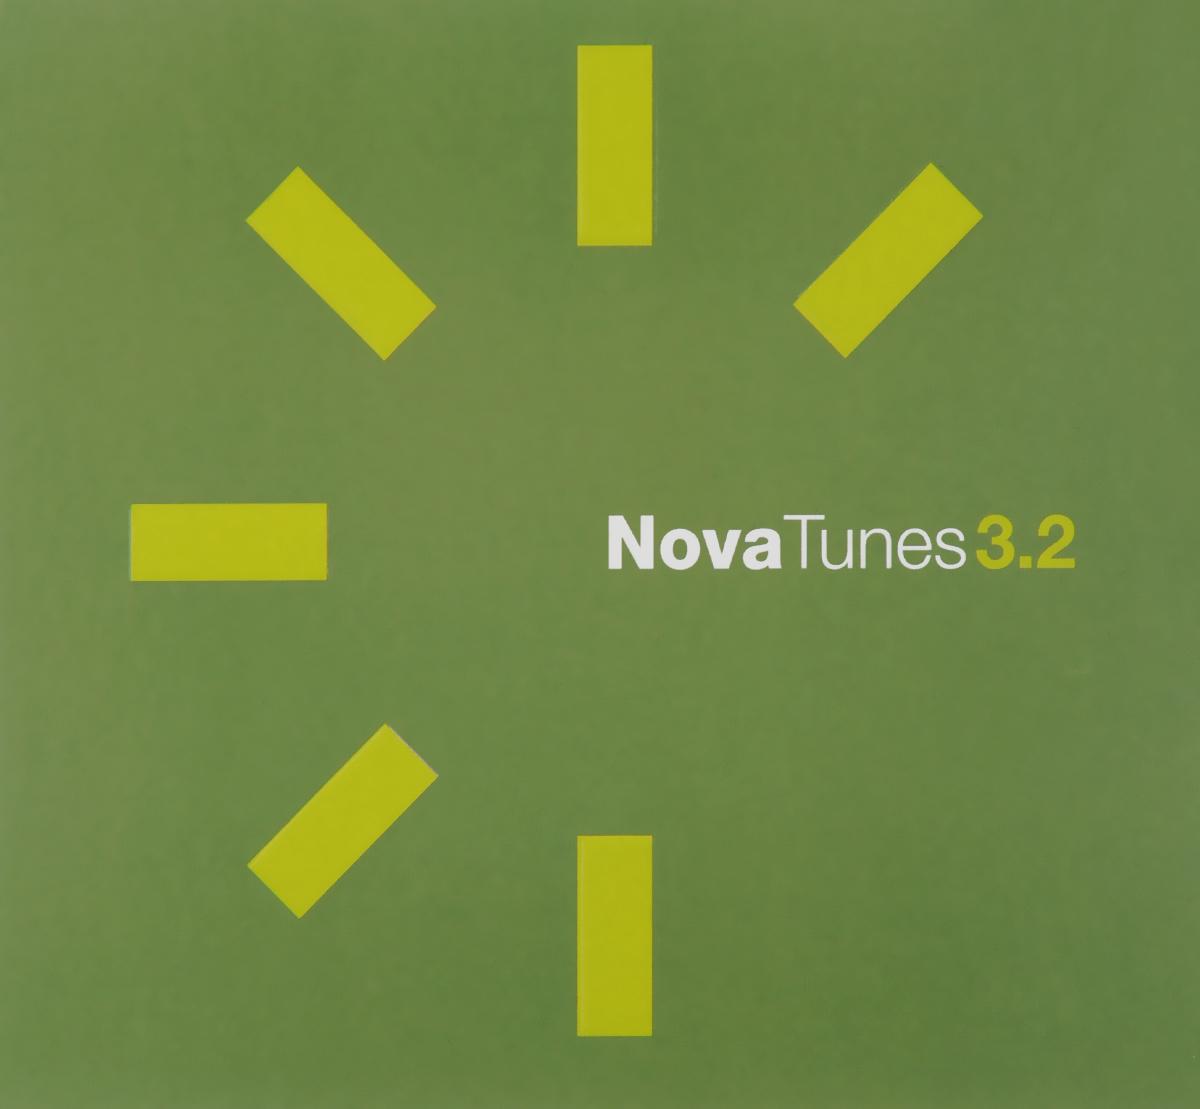 Nova Tunes 3.2 2015 Audio CD